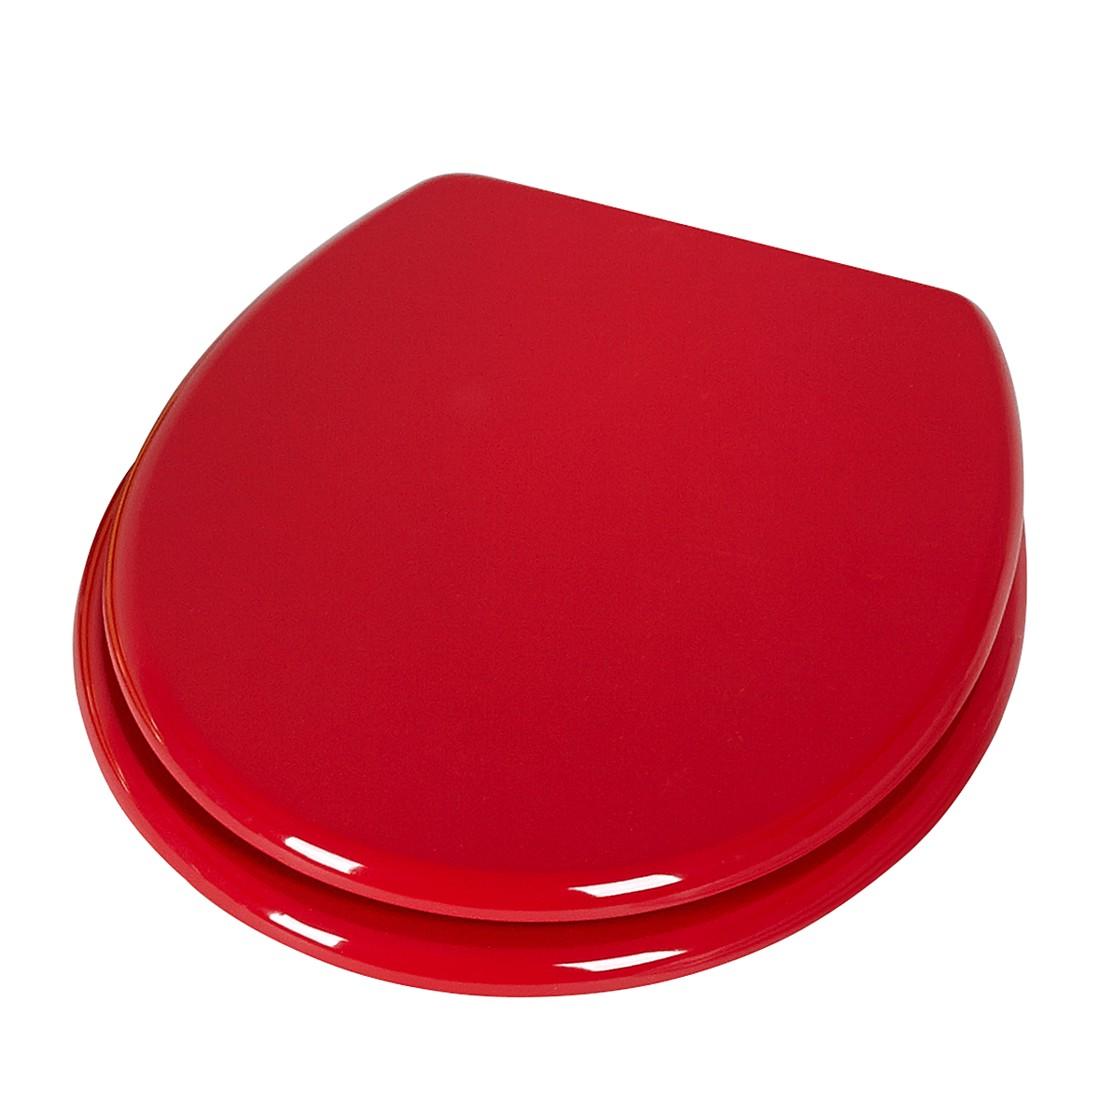 WC-Sitz Elba - Duroplast - Rot, Sanwood